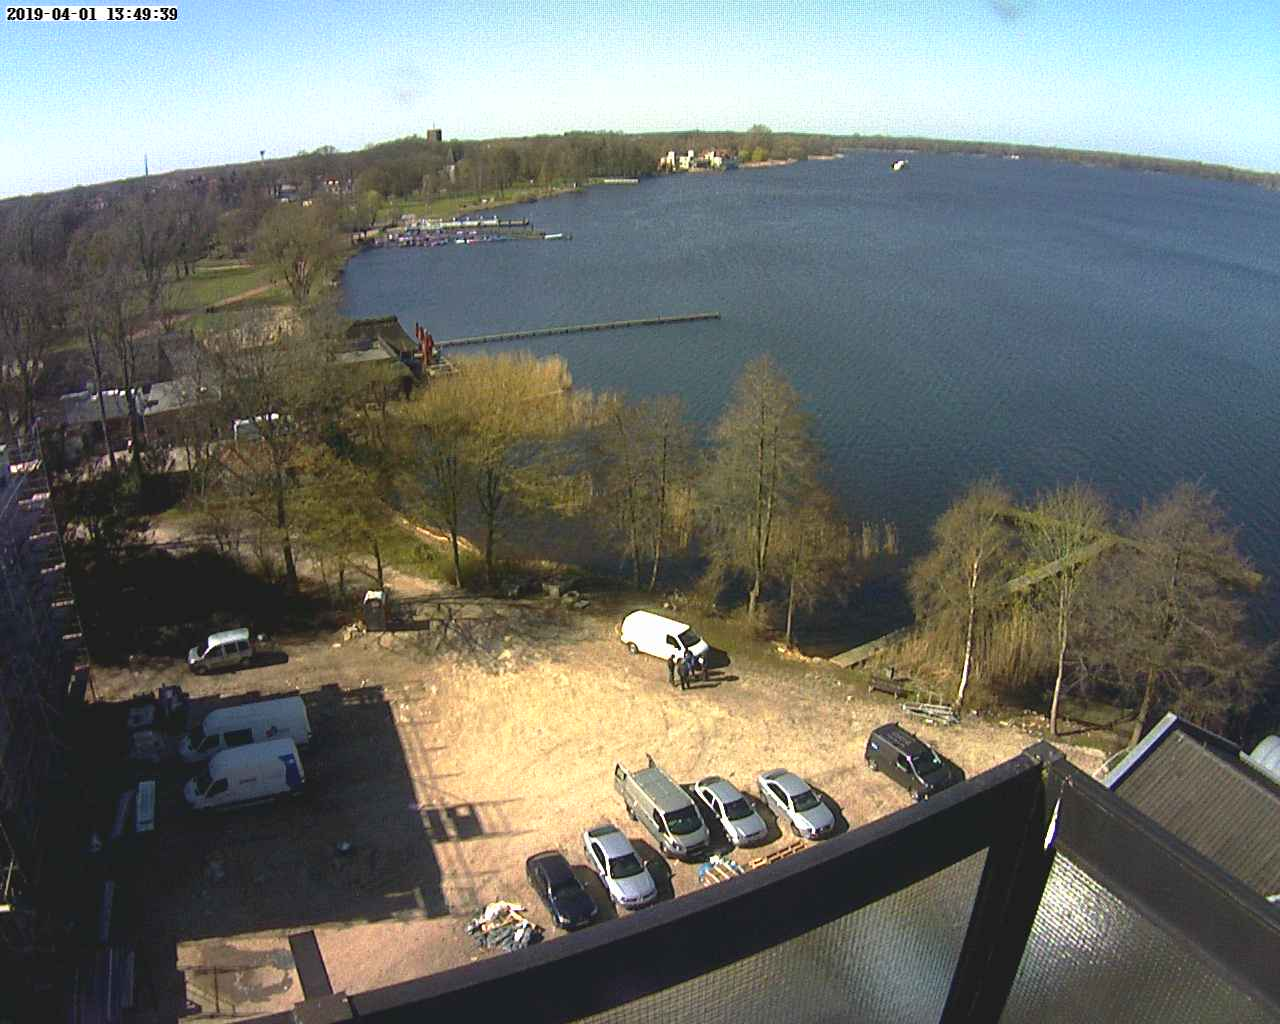 webcam bad zwischenahn zwischenahner meer and kurpark. Black Bedroom Furniture Sets. Home Design Ideas